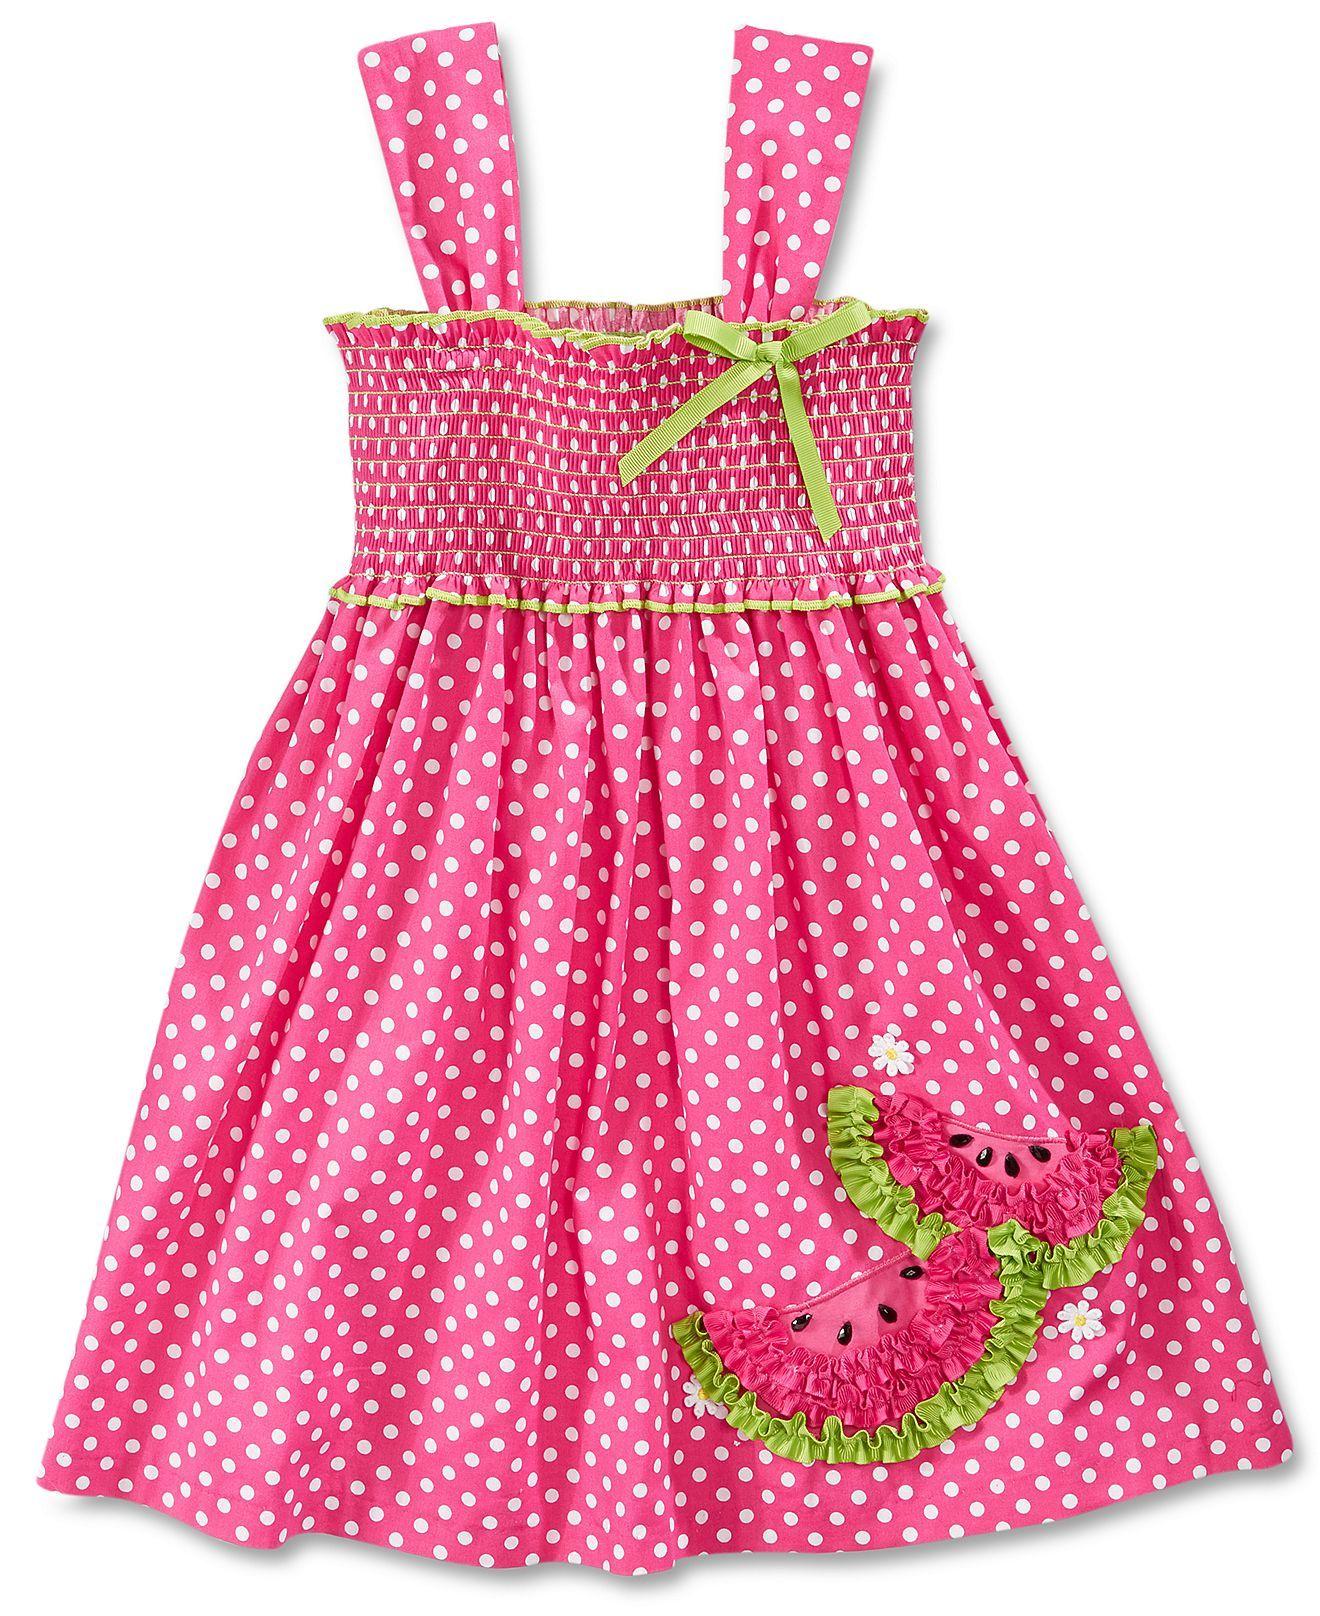 571b4db872d5 Bonnie Jean Little Girls  Dotted Smocked Sundress - Kids Dresses    Dresswear - Macy s